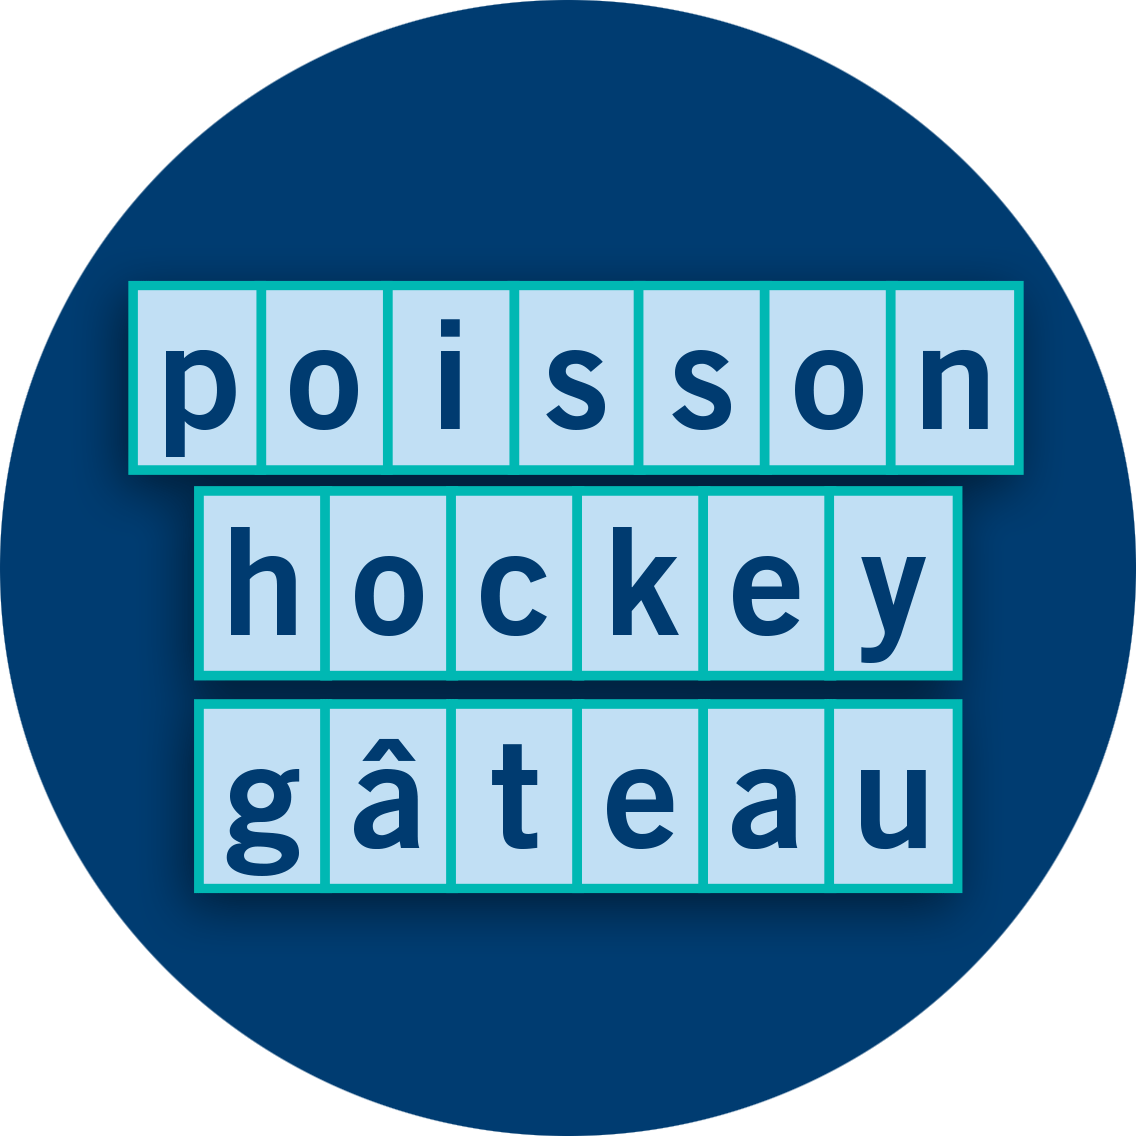 Poisson hockey gâteau